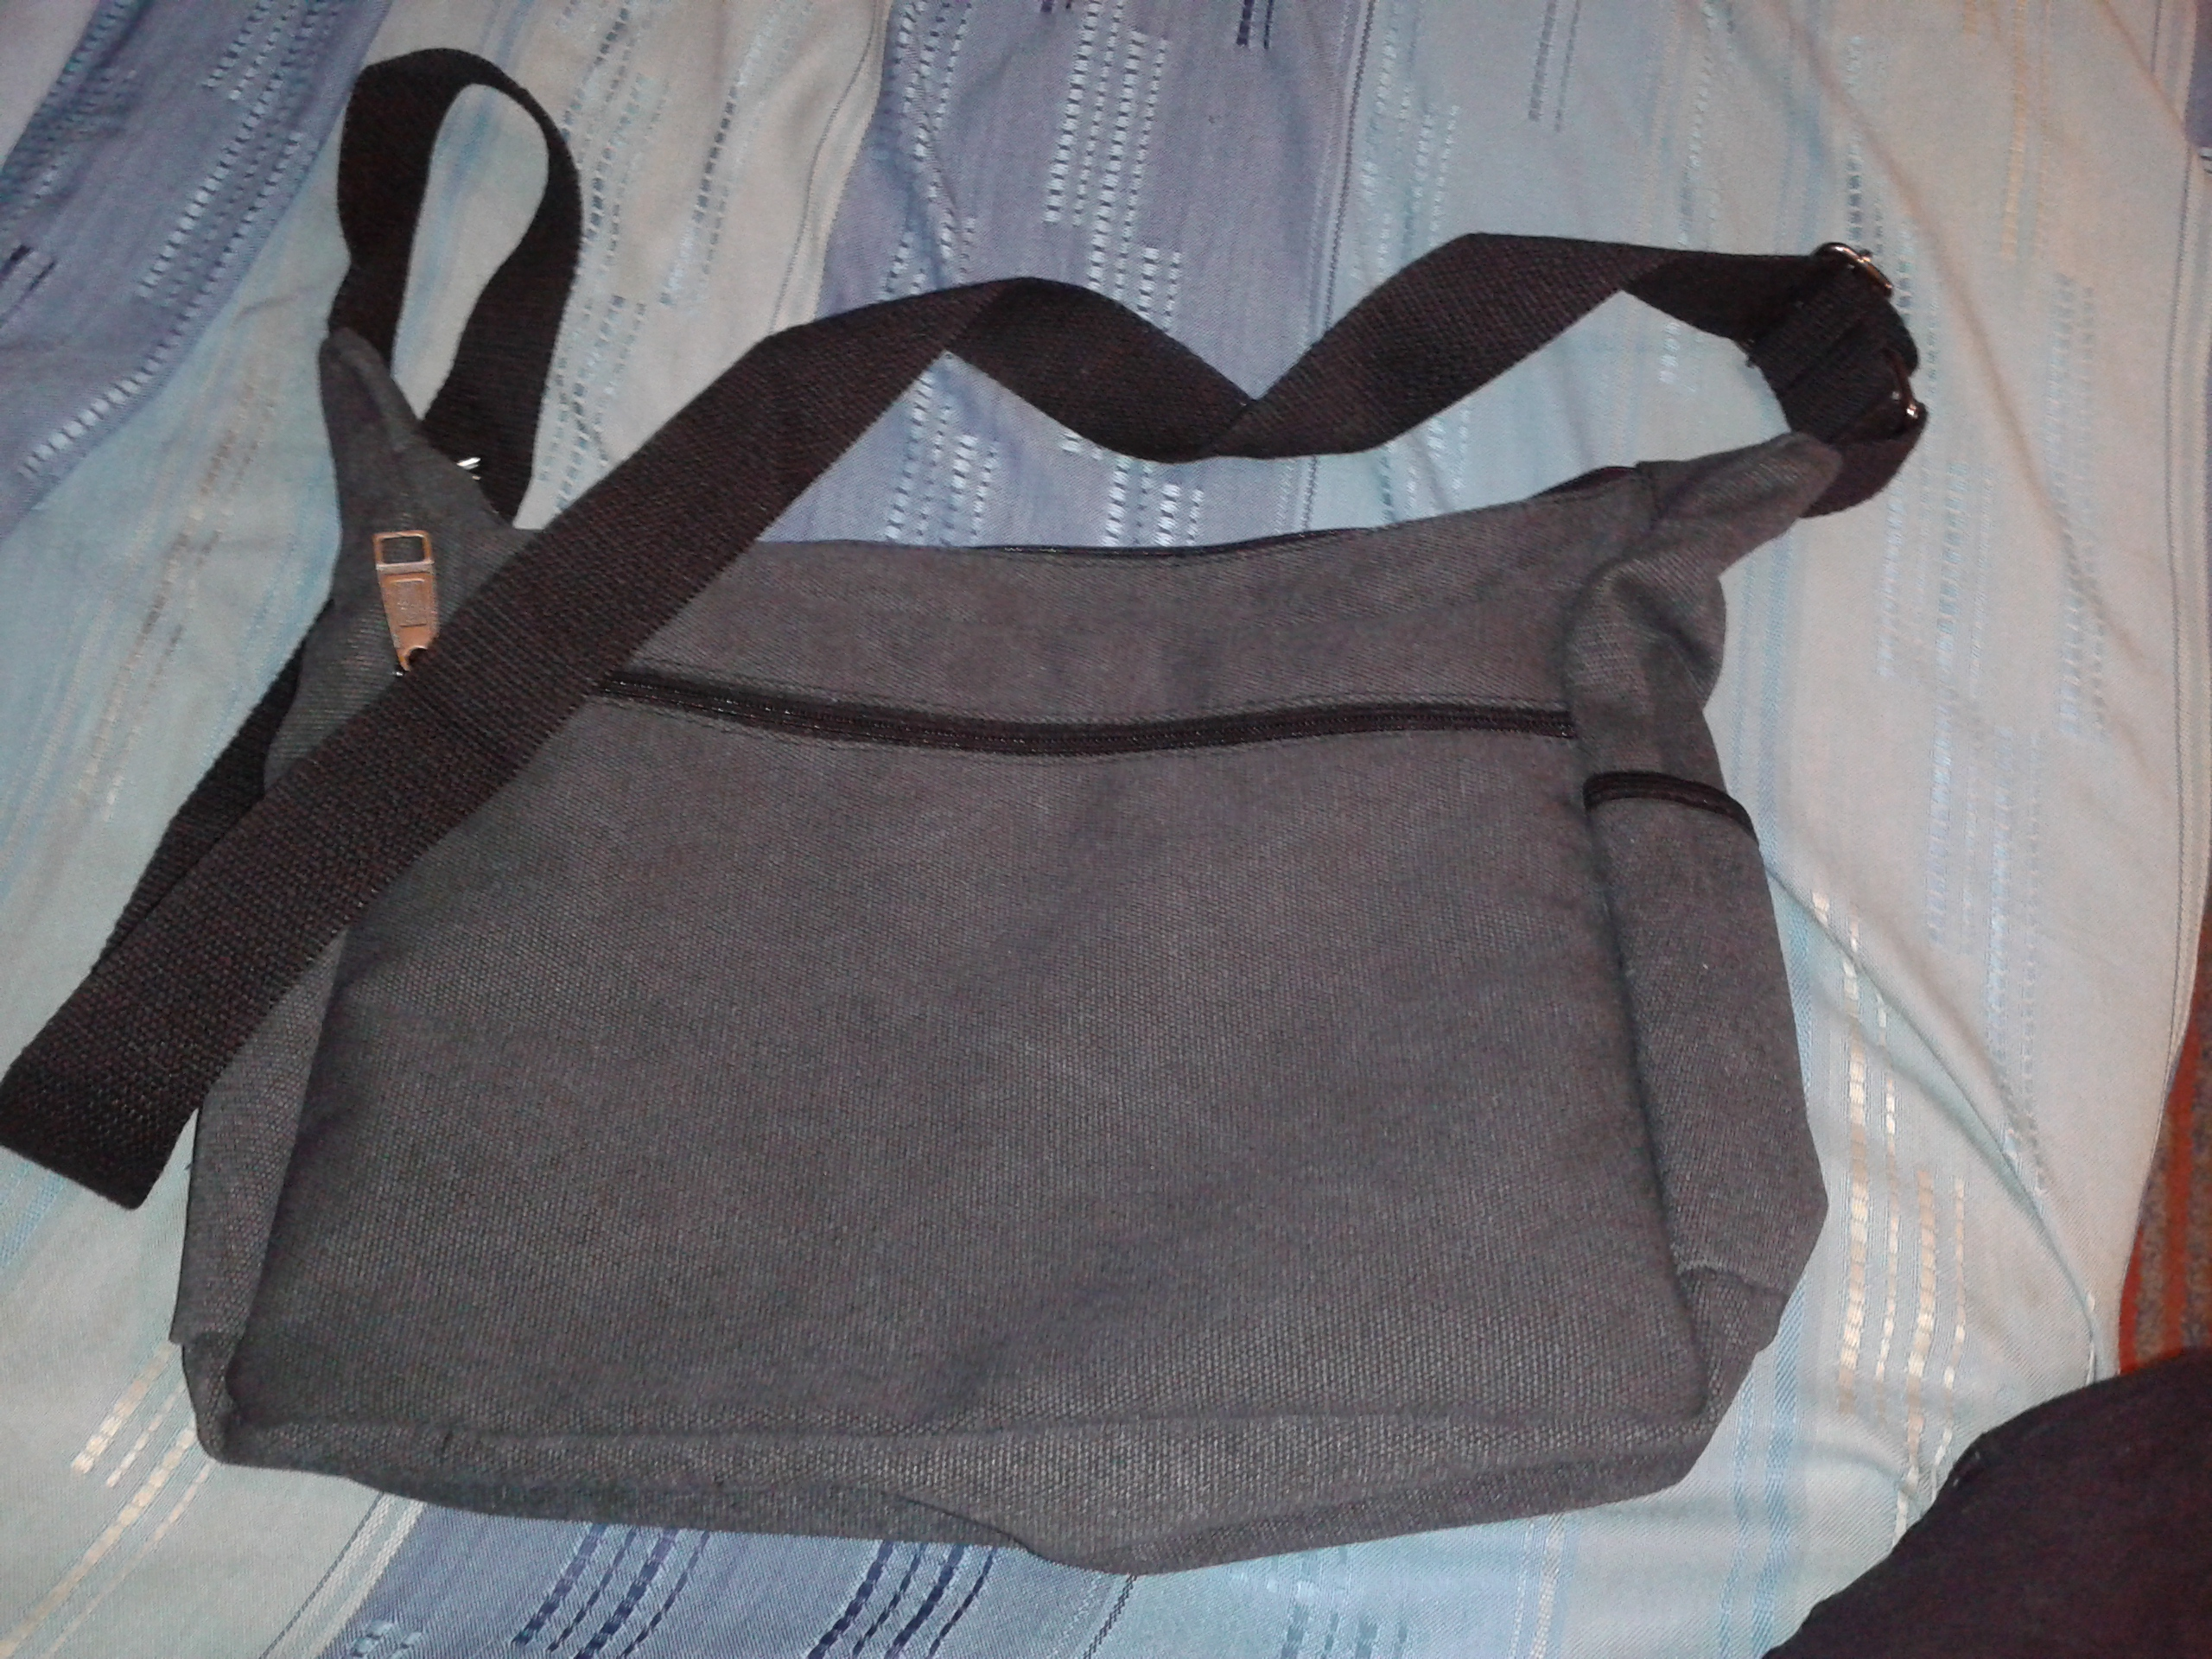 Men's Casual Handbags Canvas High Quality Clutch Solid Phone Purse Crossbody School Bag Flap Sac A Main Simple Male Bags Travel photo review